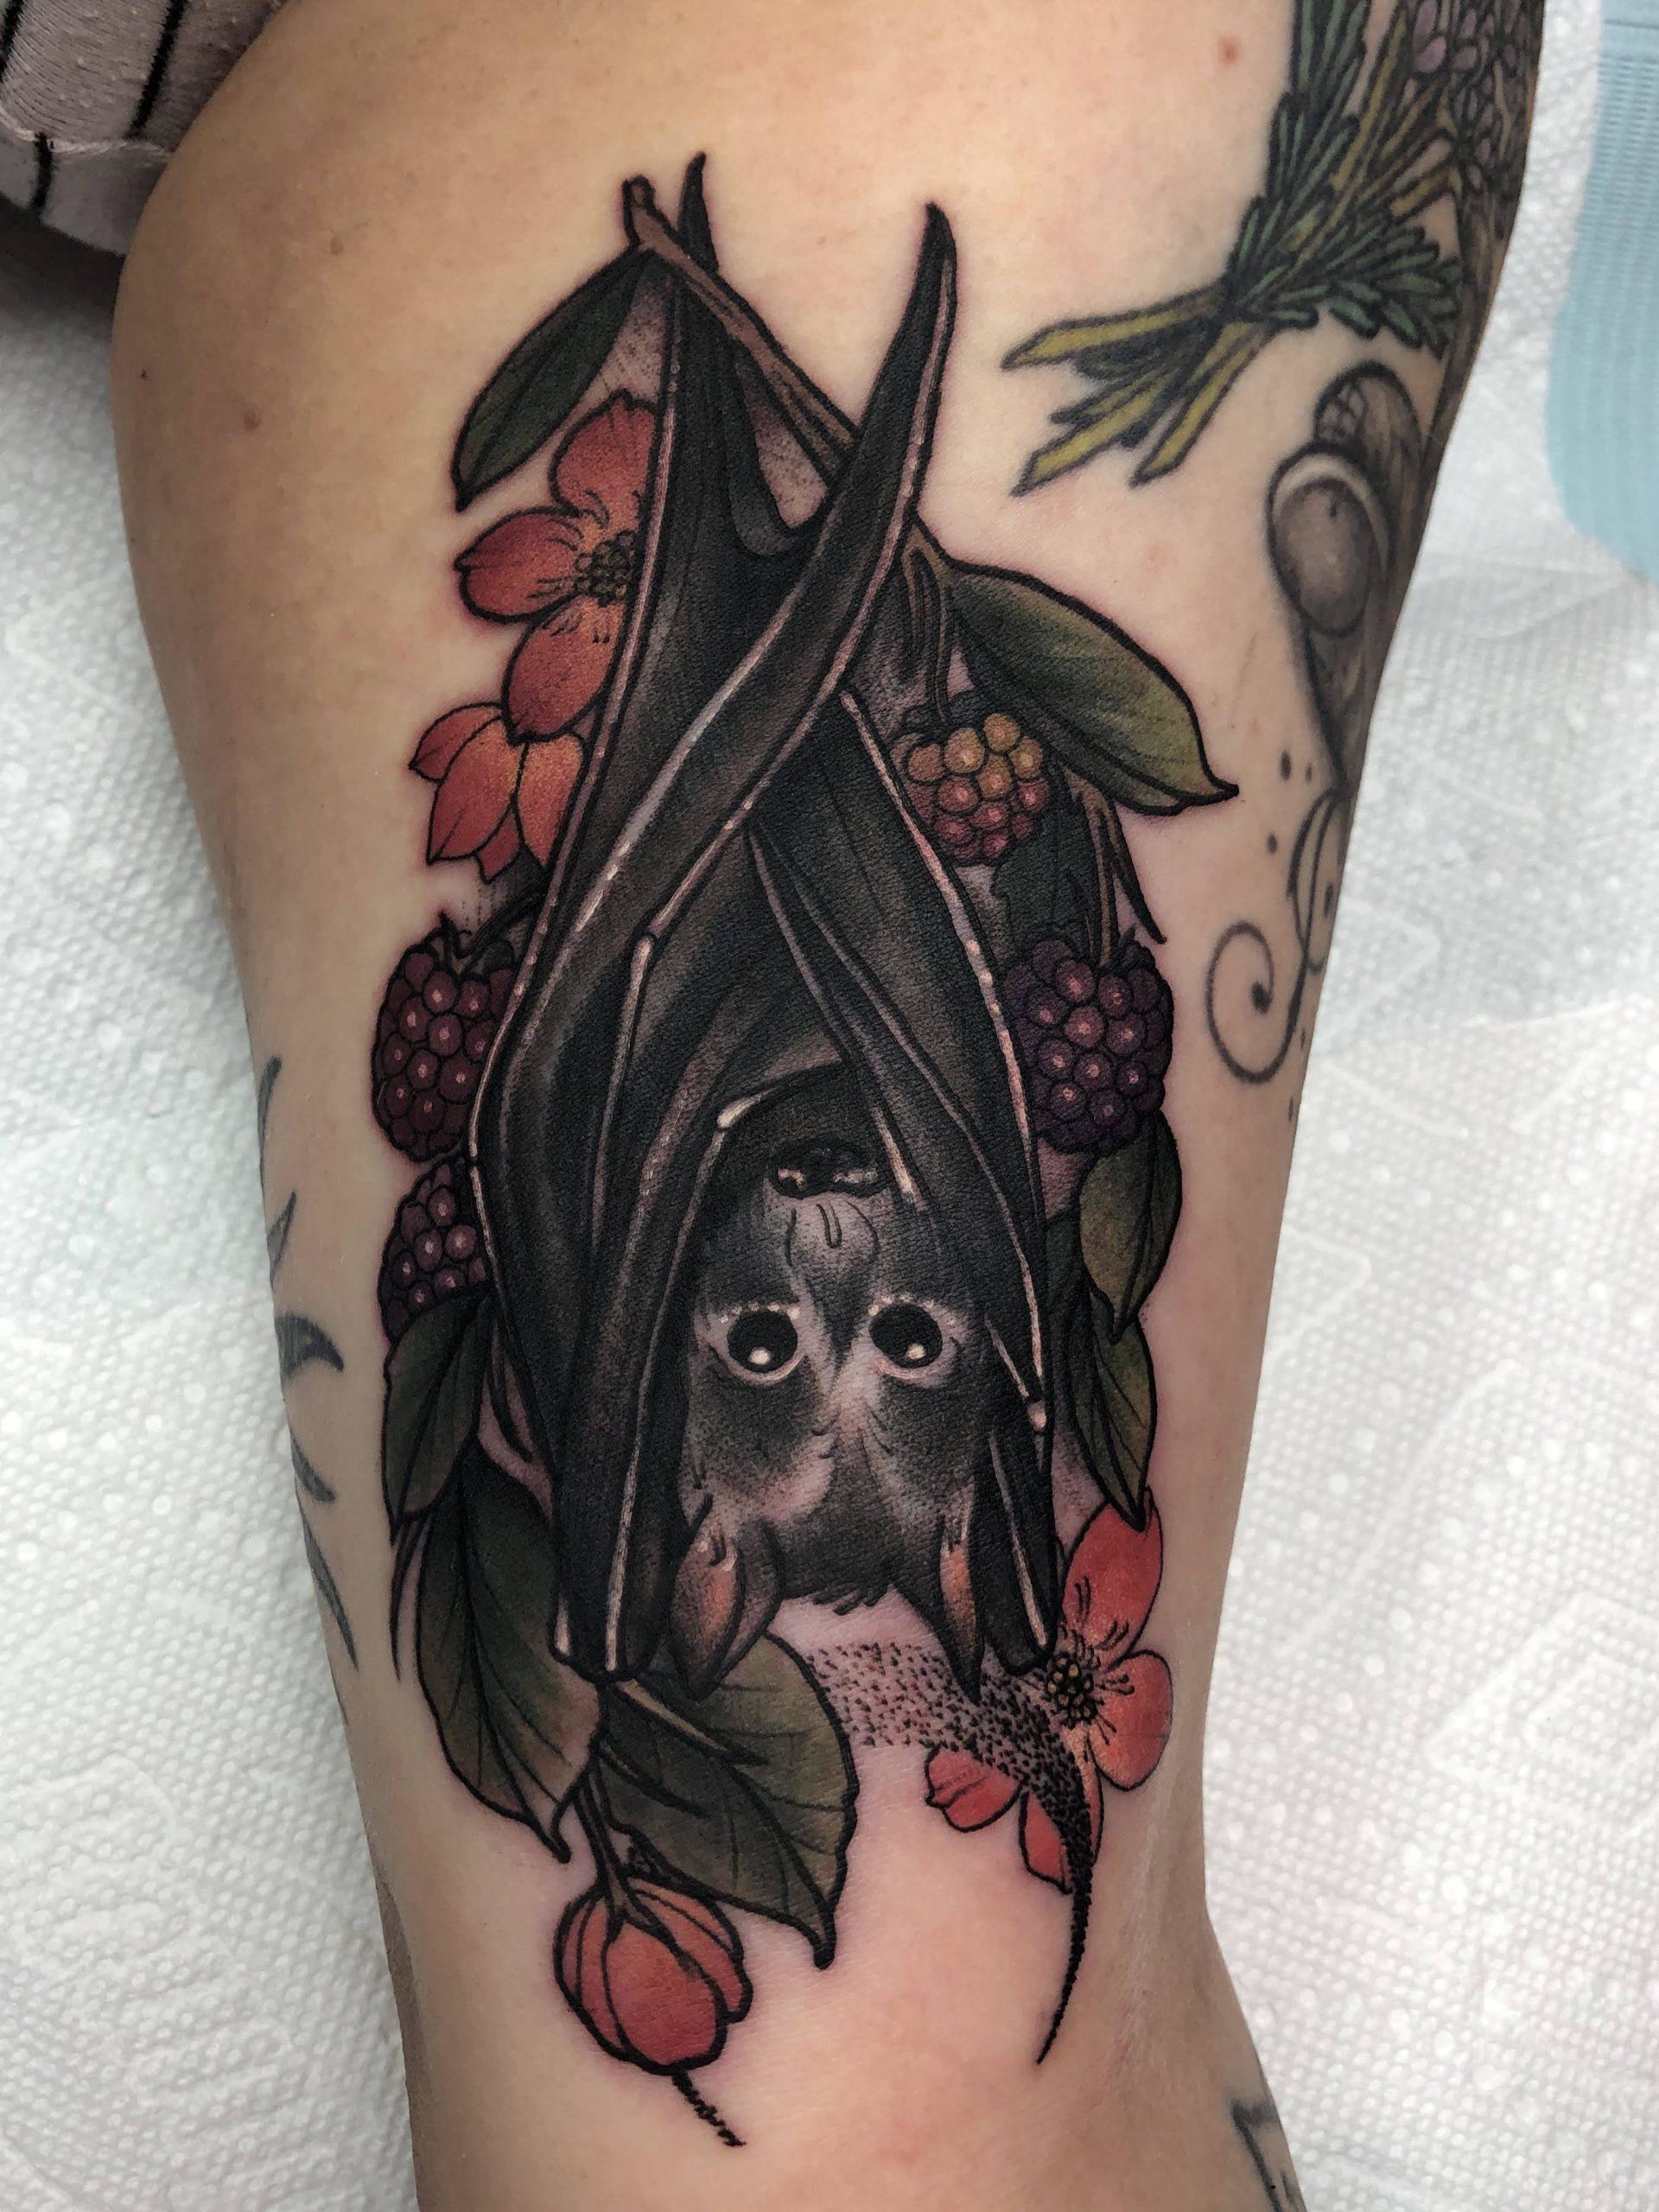 tattoos-samantha.jpg#asset:116603